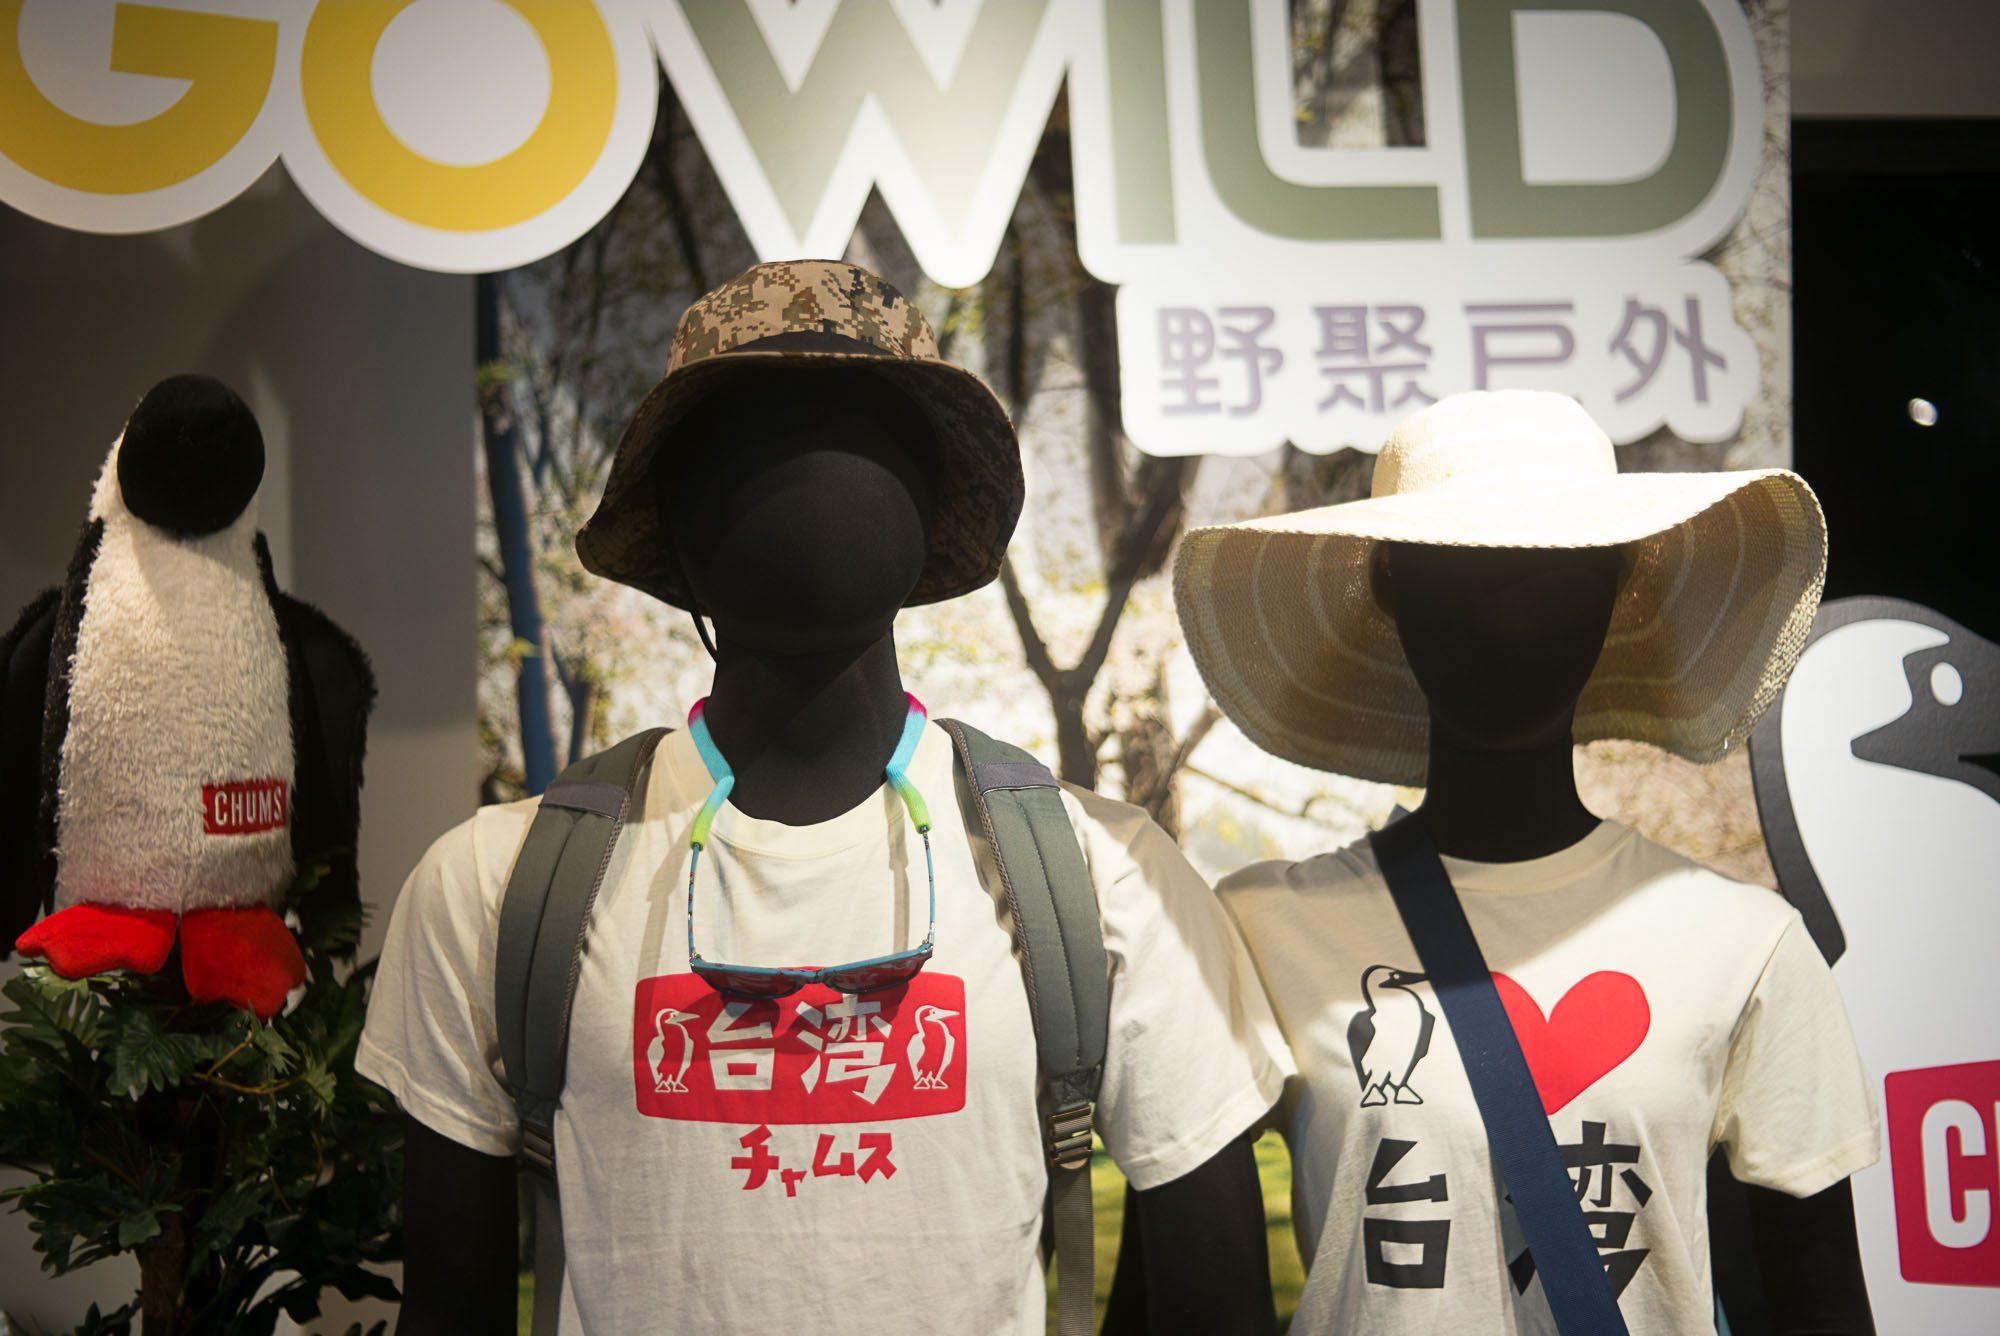 gowild02